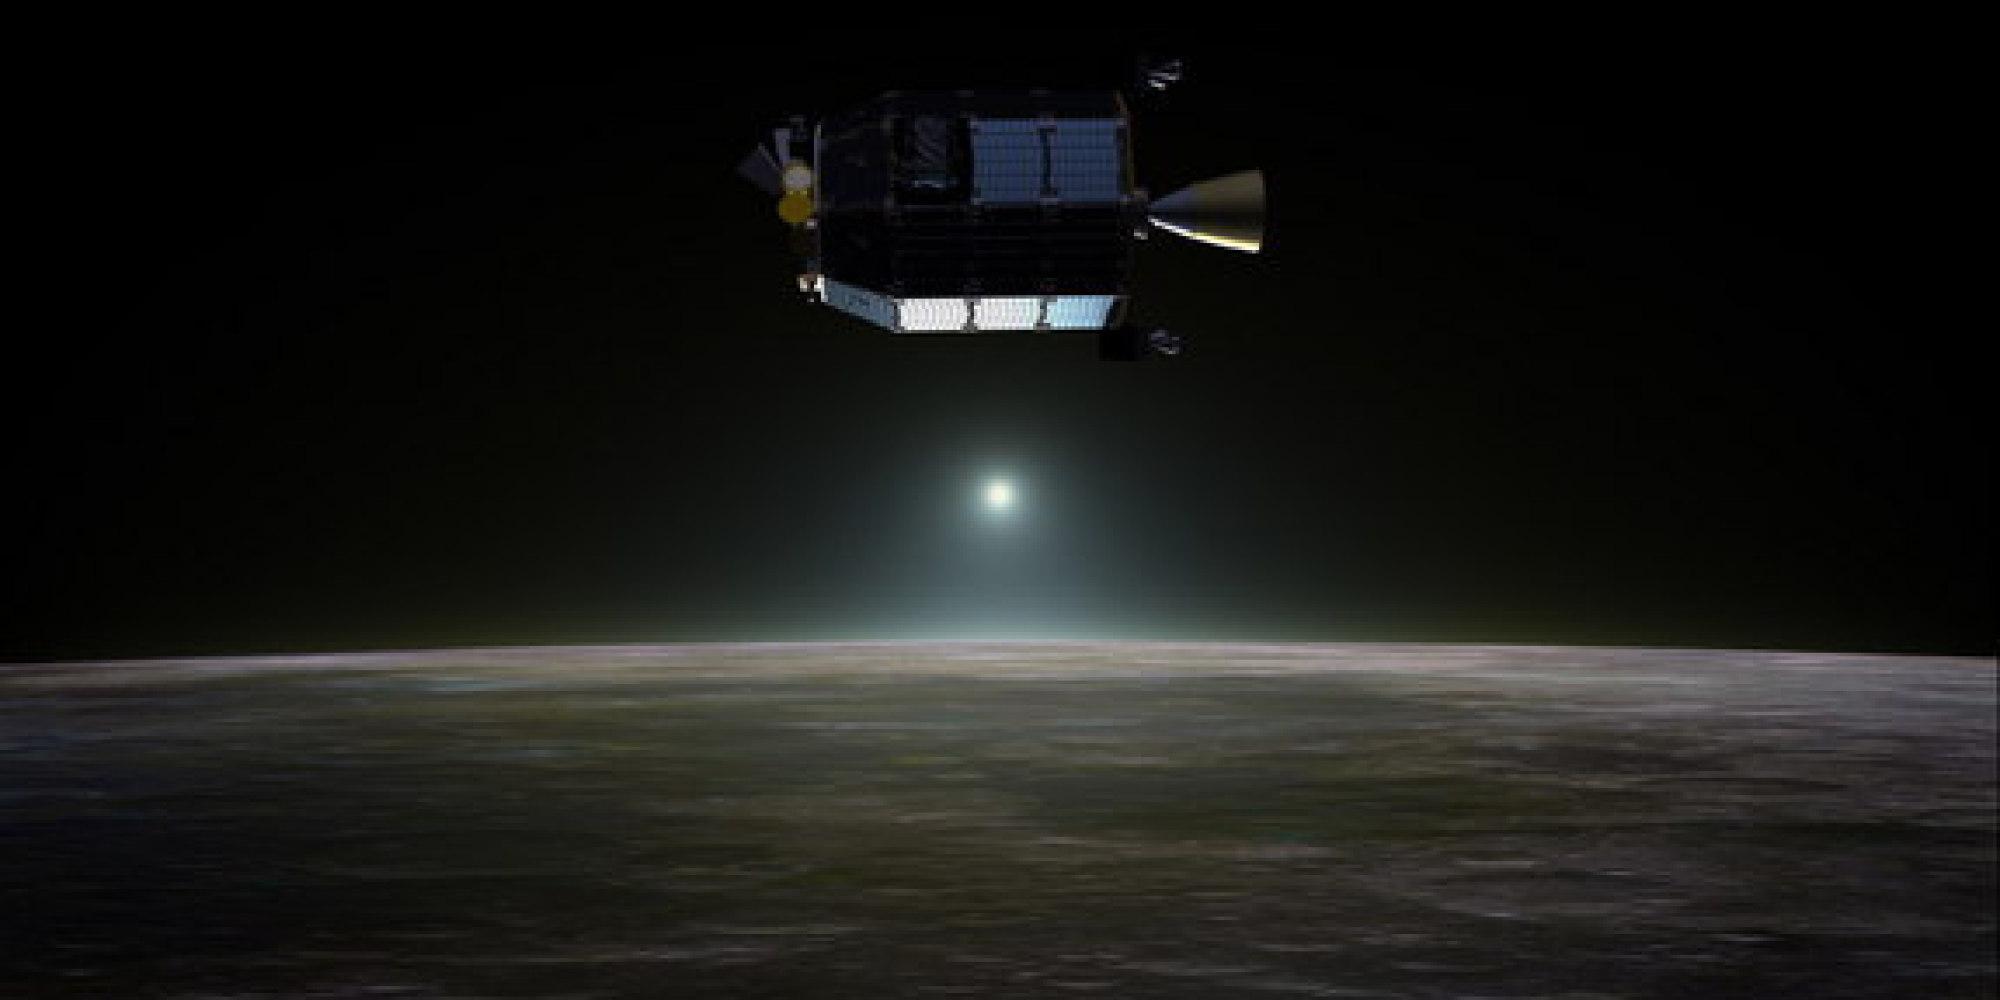 lunar dust in space - photo #18